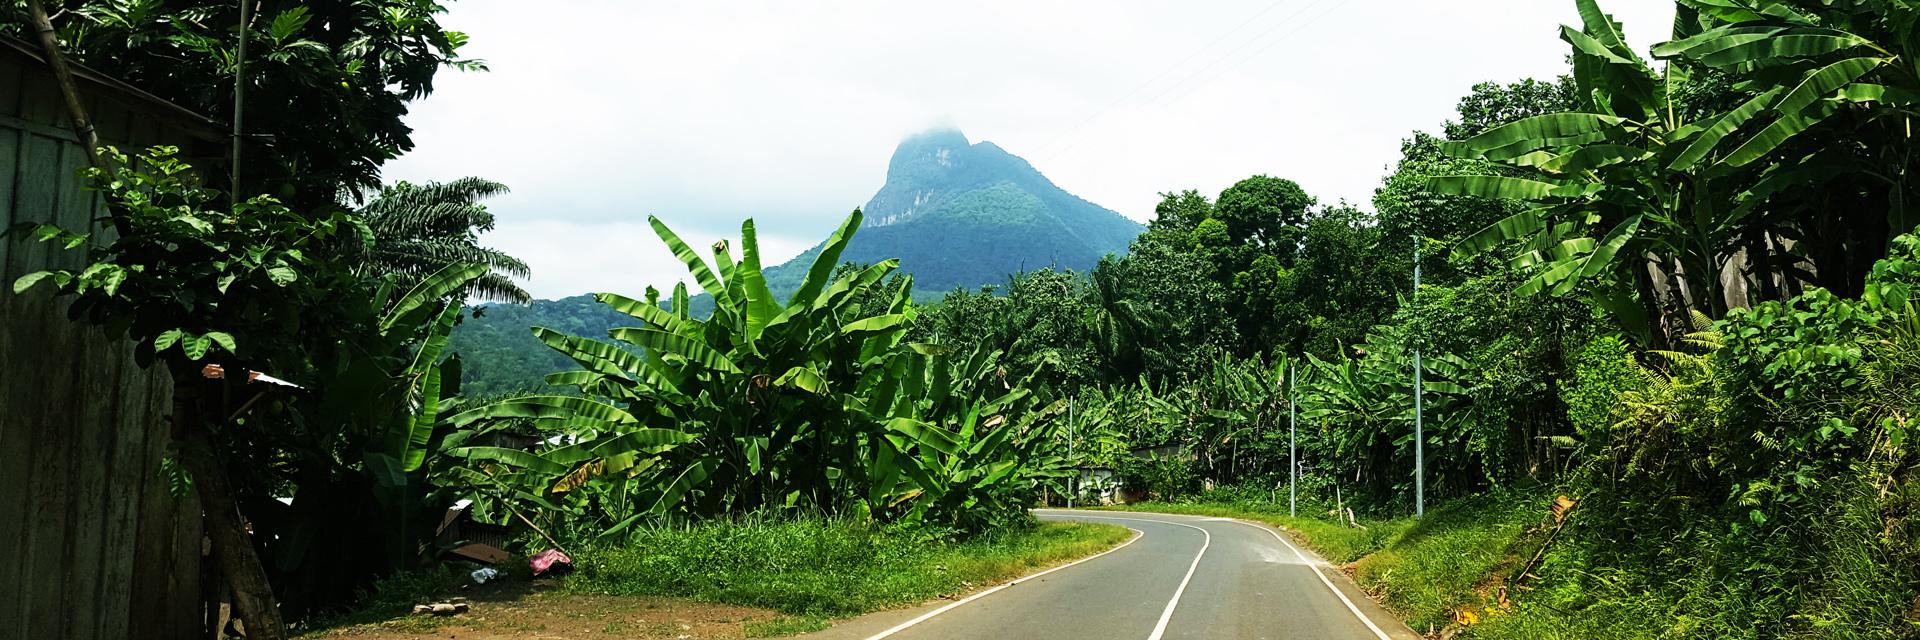 Excursion south area